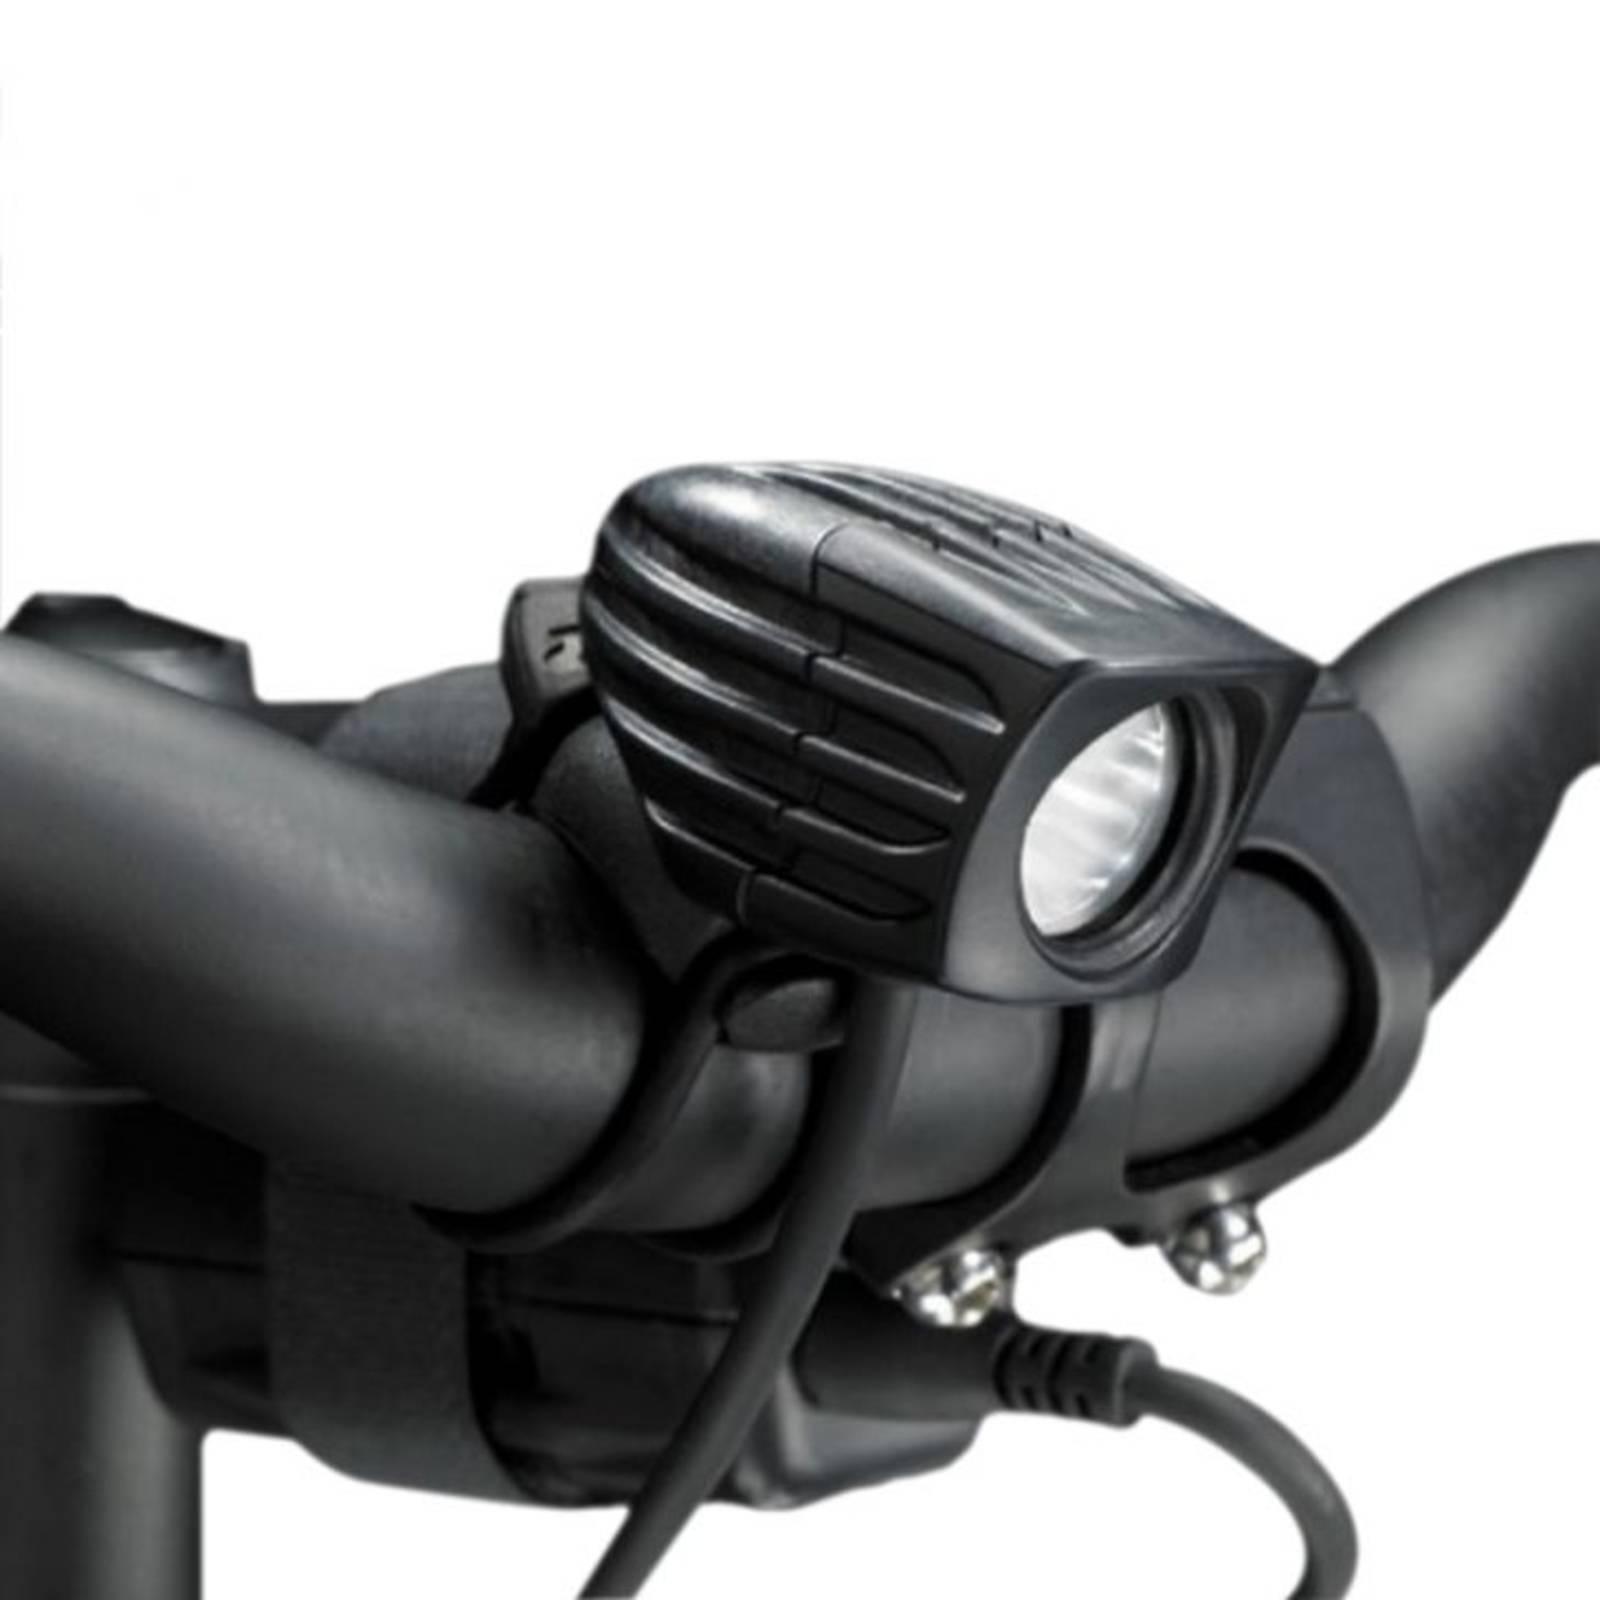 Farol NiteRider Para Bicicleta Dianteiro MiNewt Mini 350 USB Plus - BIKE ALLA CARTE